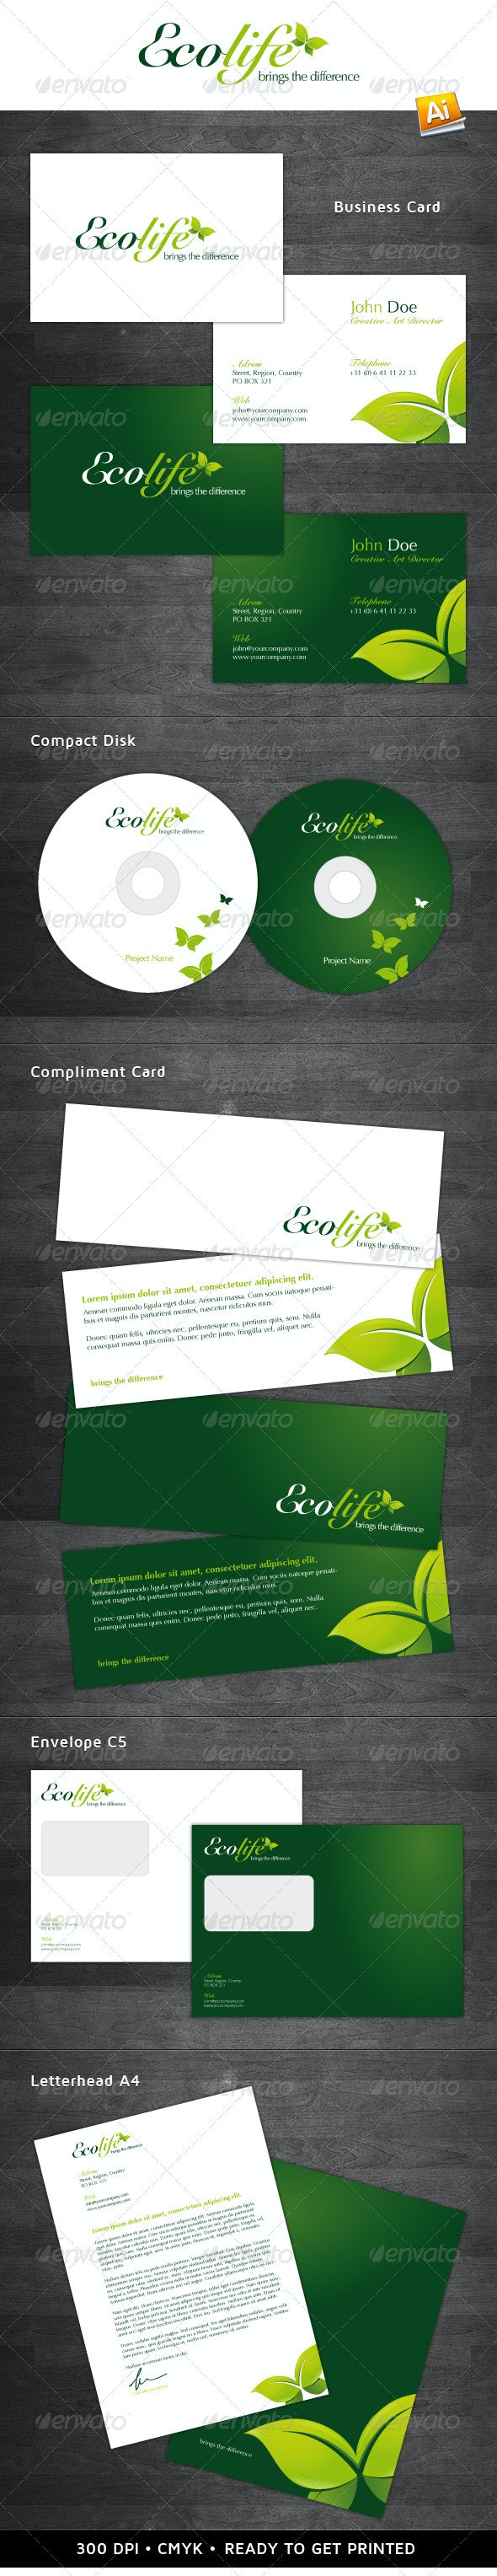 Ecolife Corporate Identity - Stationery Print Templates